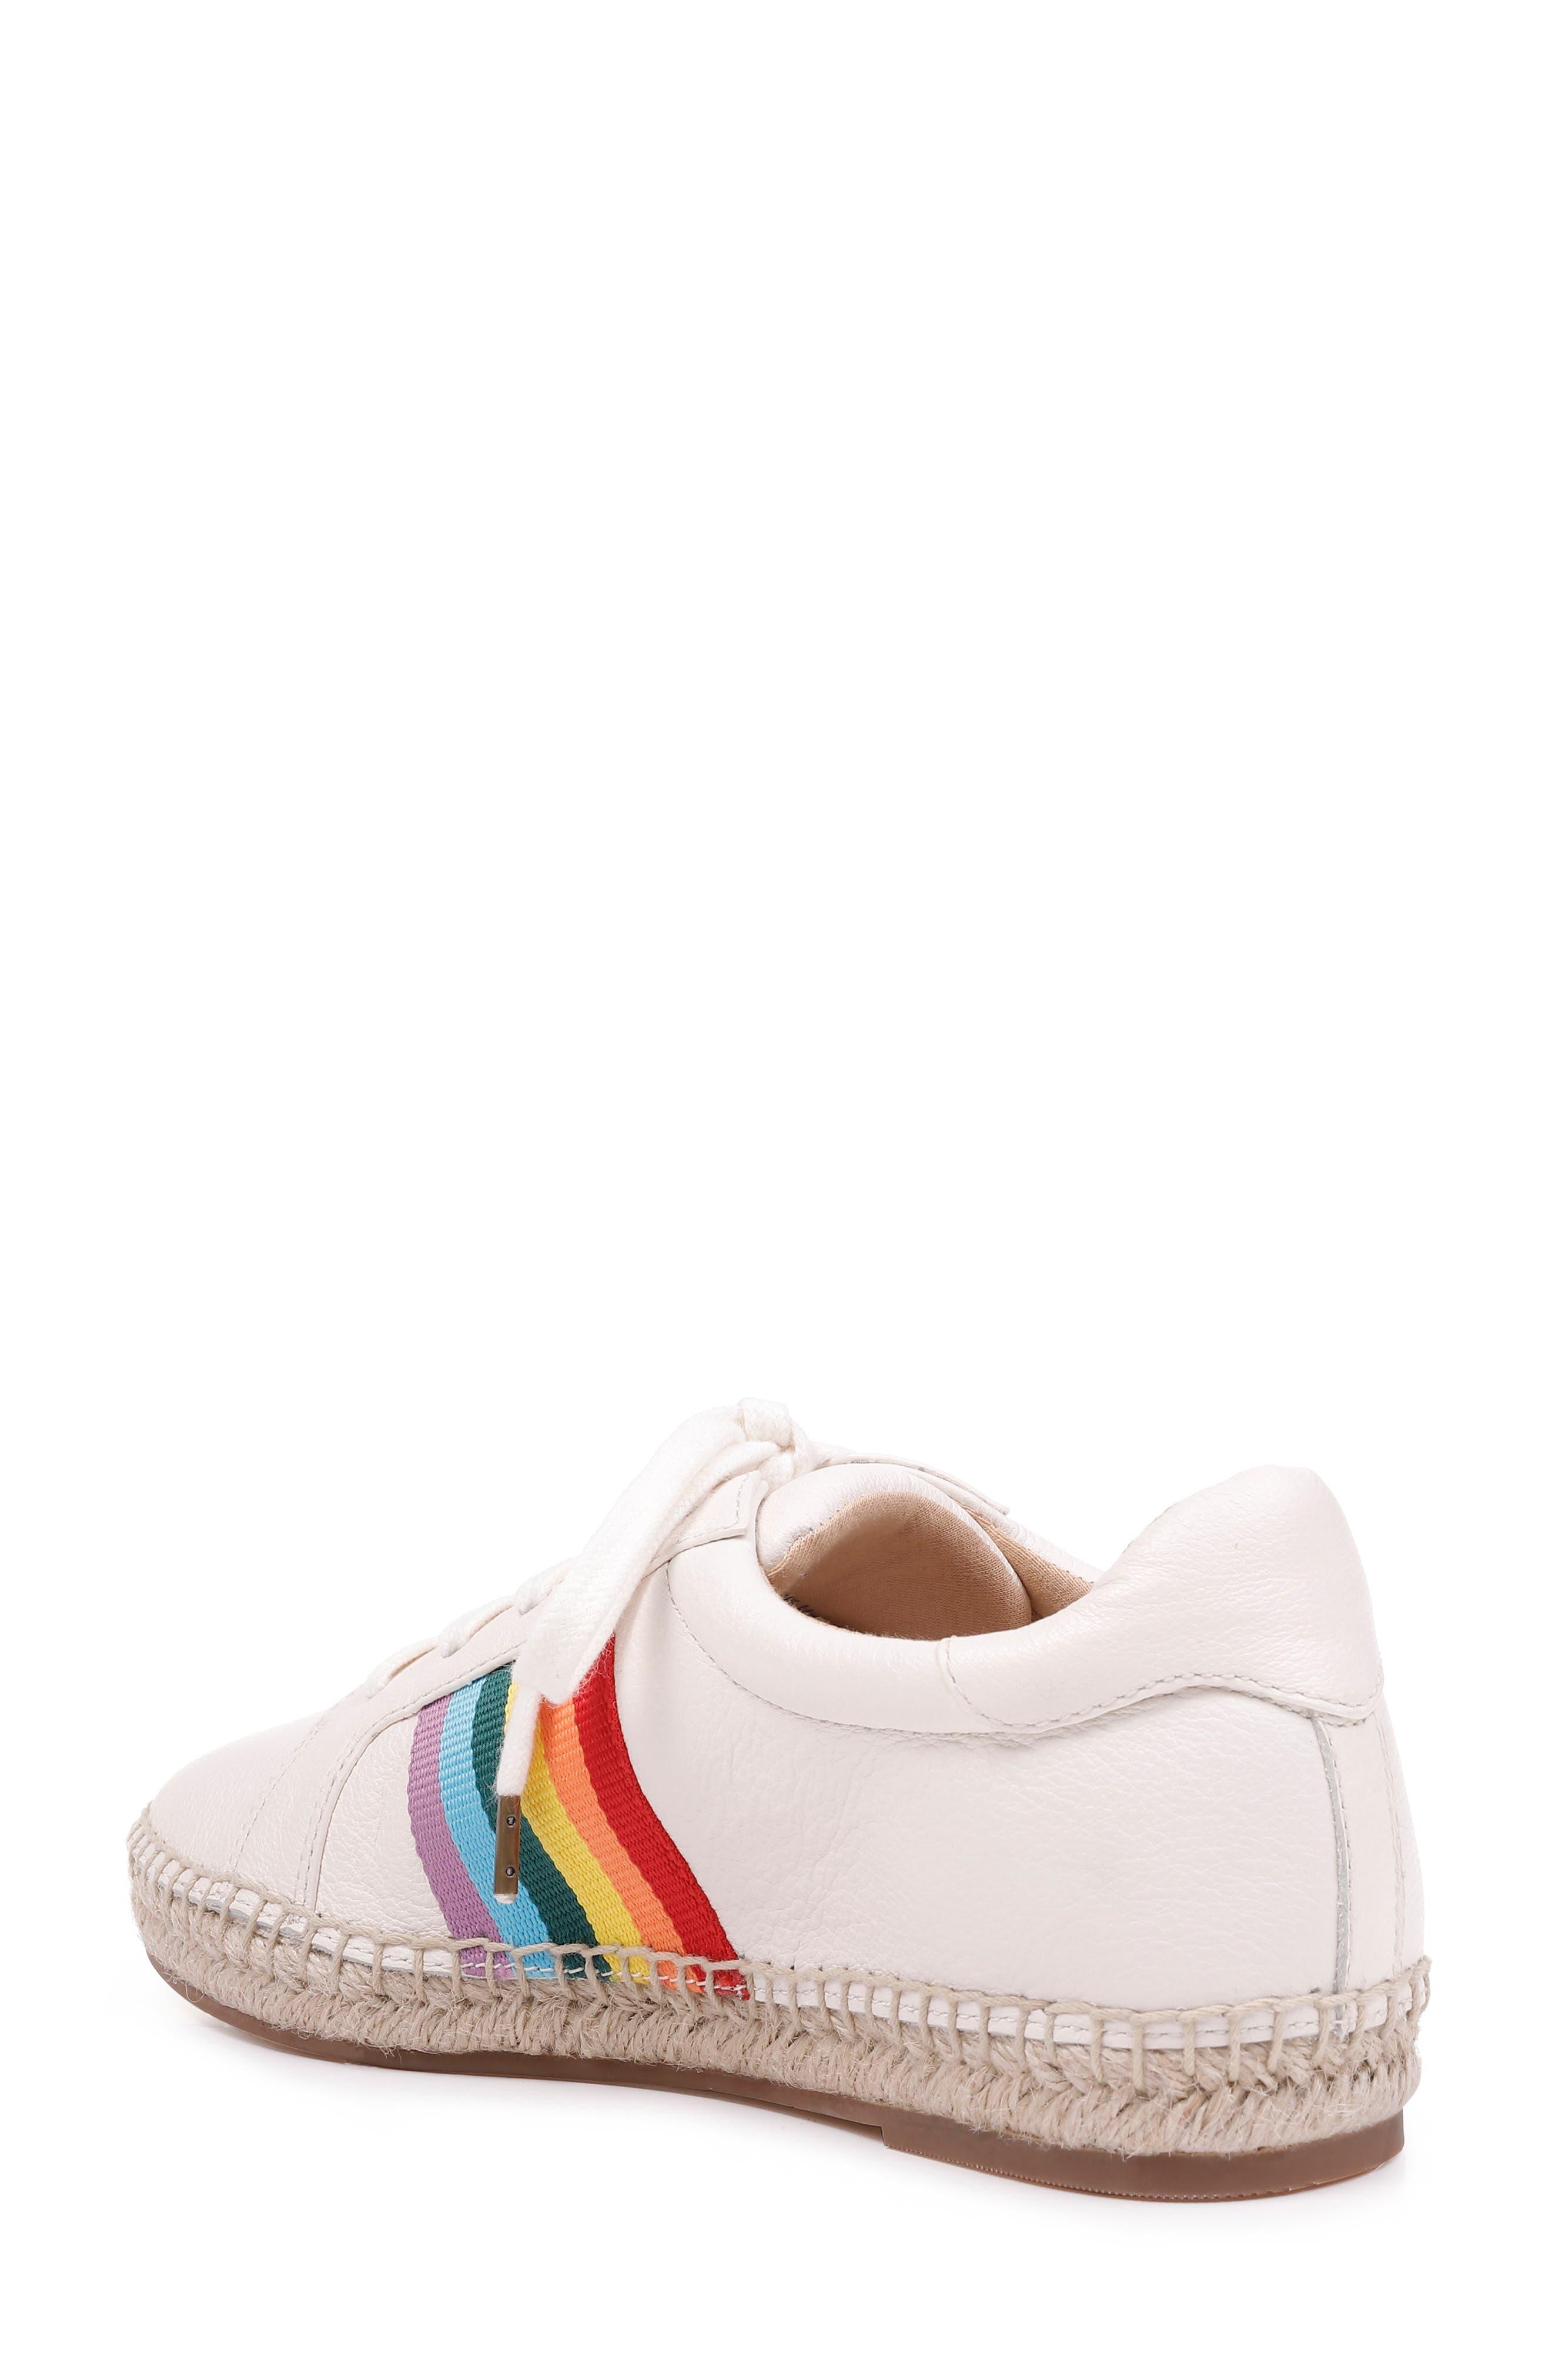 SPLENDID, Sada Espadrille Sneaker, Alternate thumbnail 2, color, OFF WHITE LEATHER